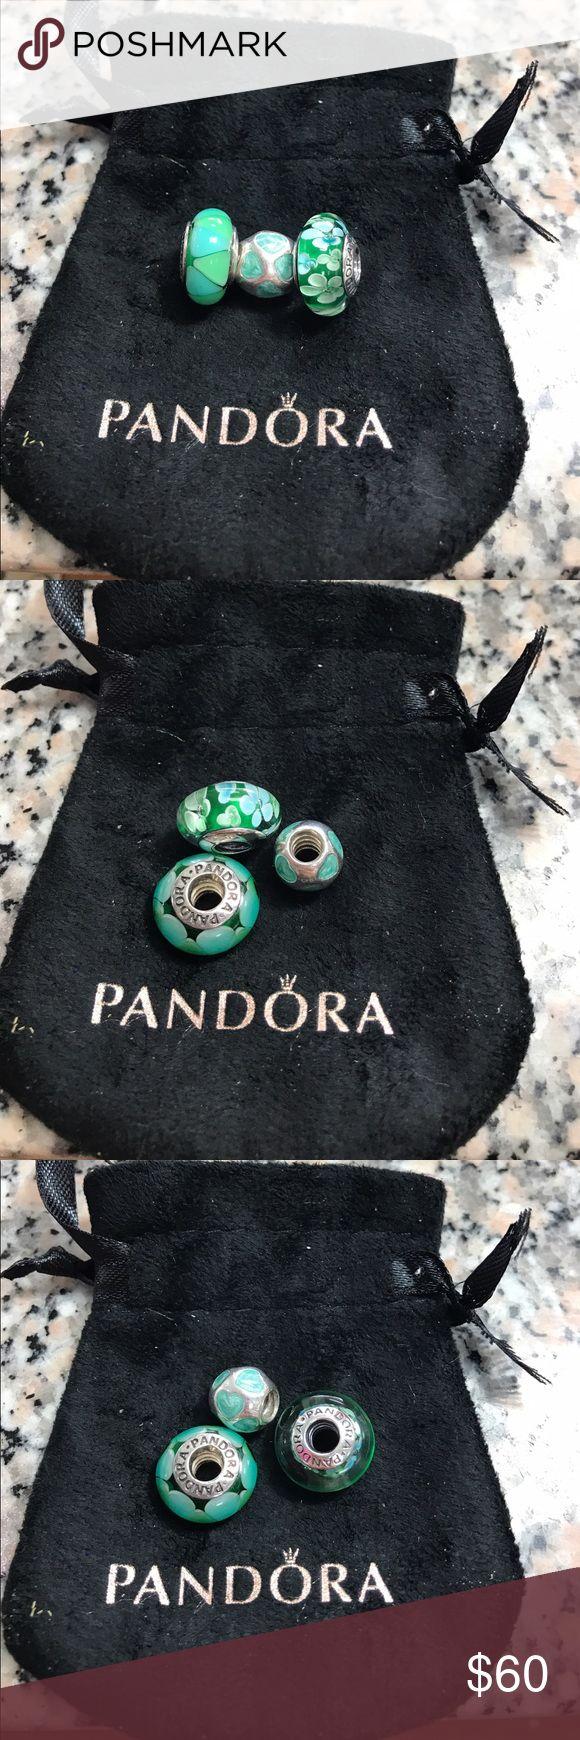 3 Pandora glass bead All Sterling Silver stamped 925. No trade Pandora Jewelry Bracelets